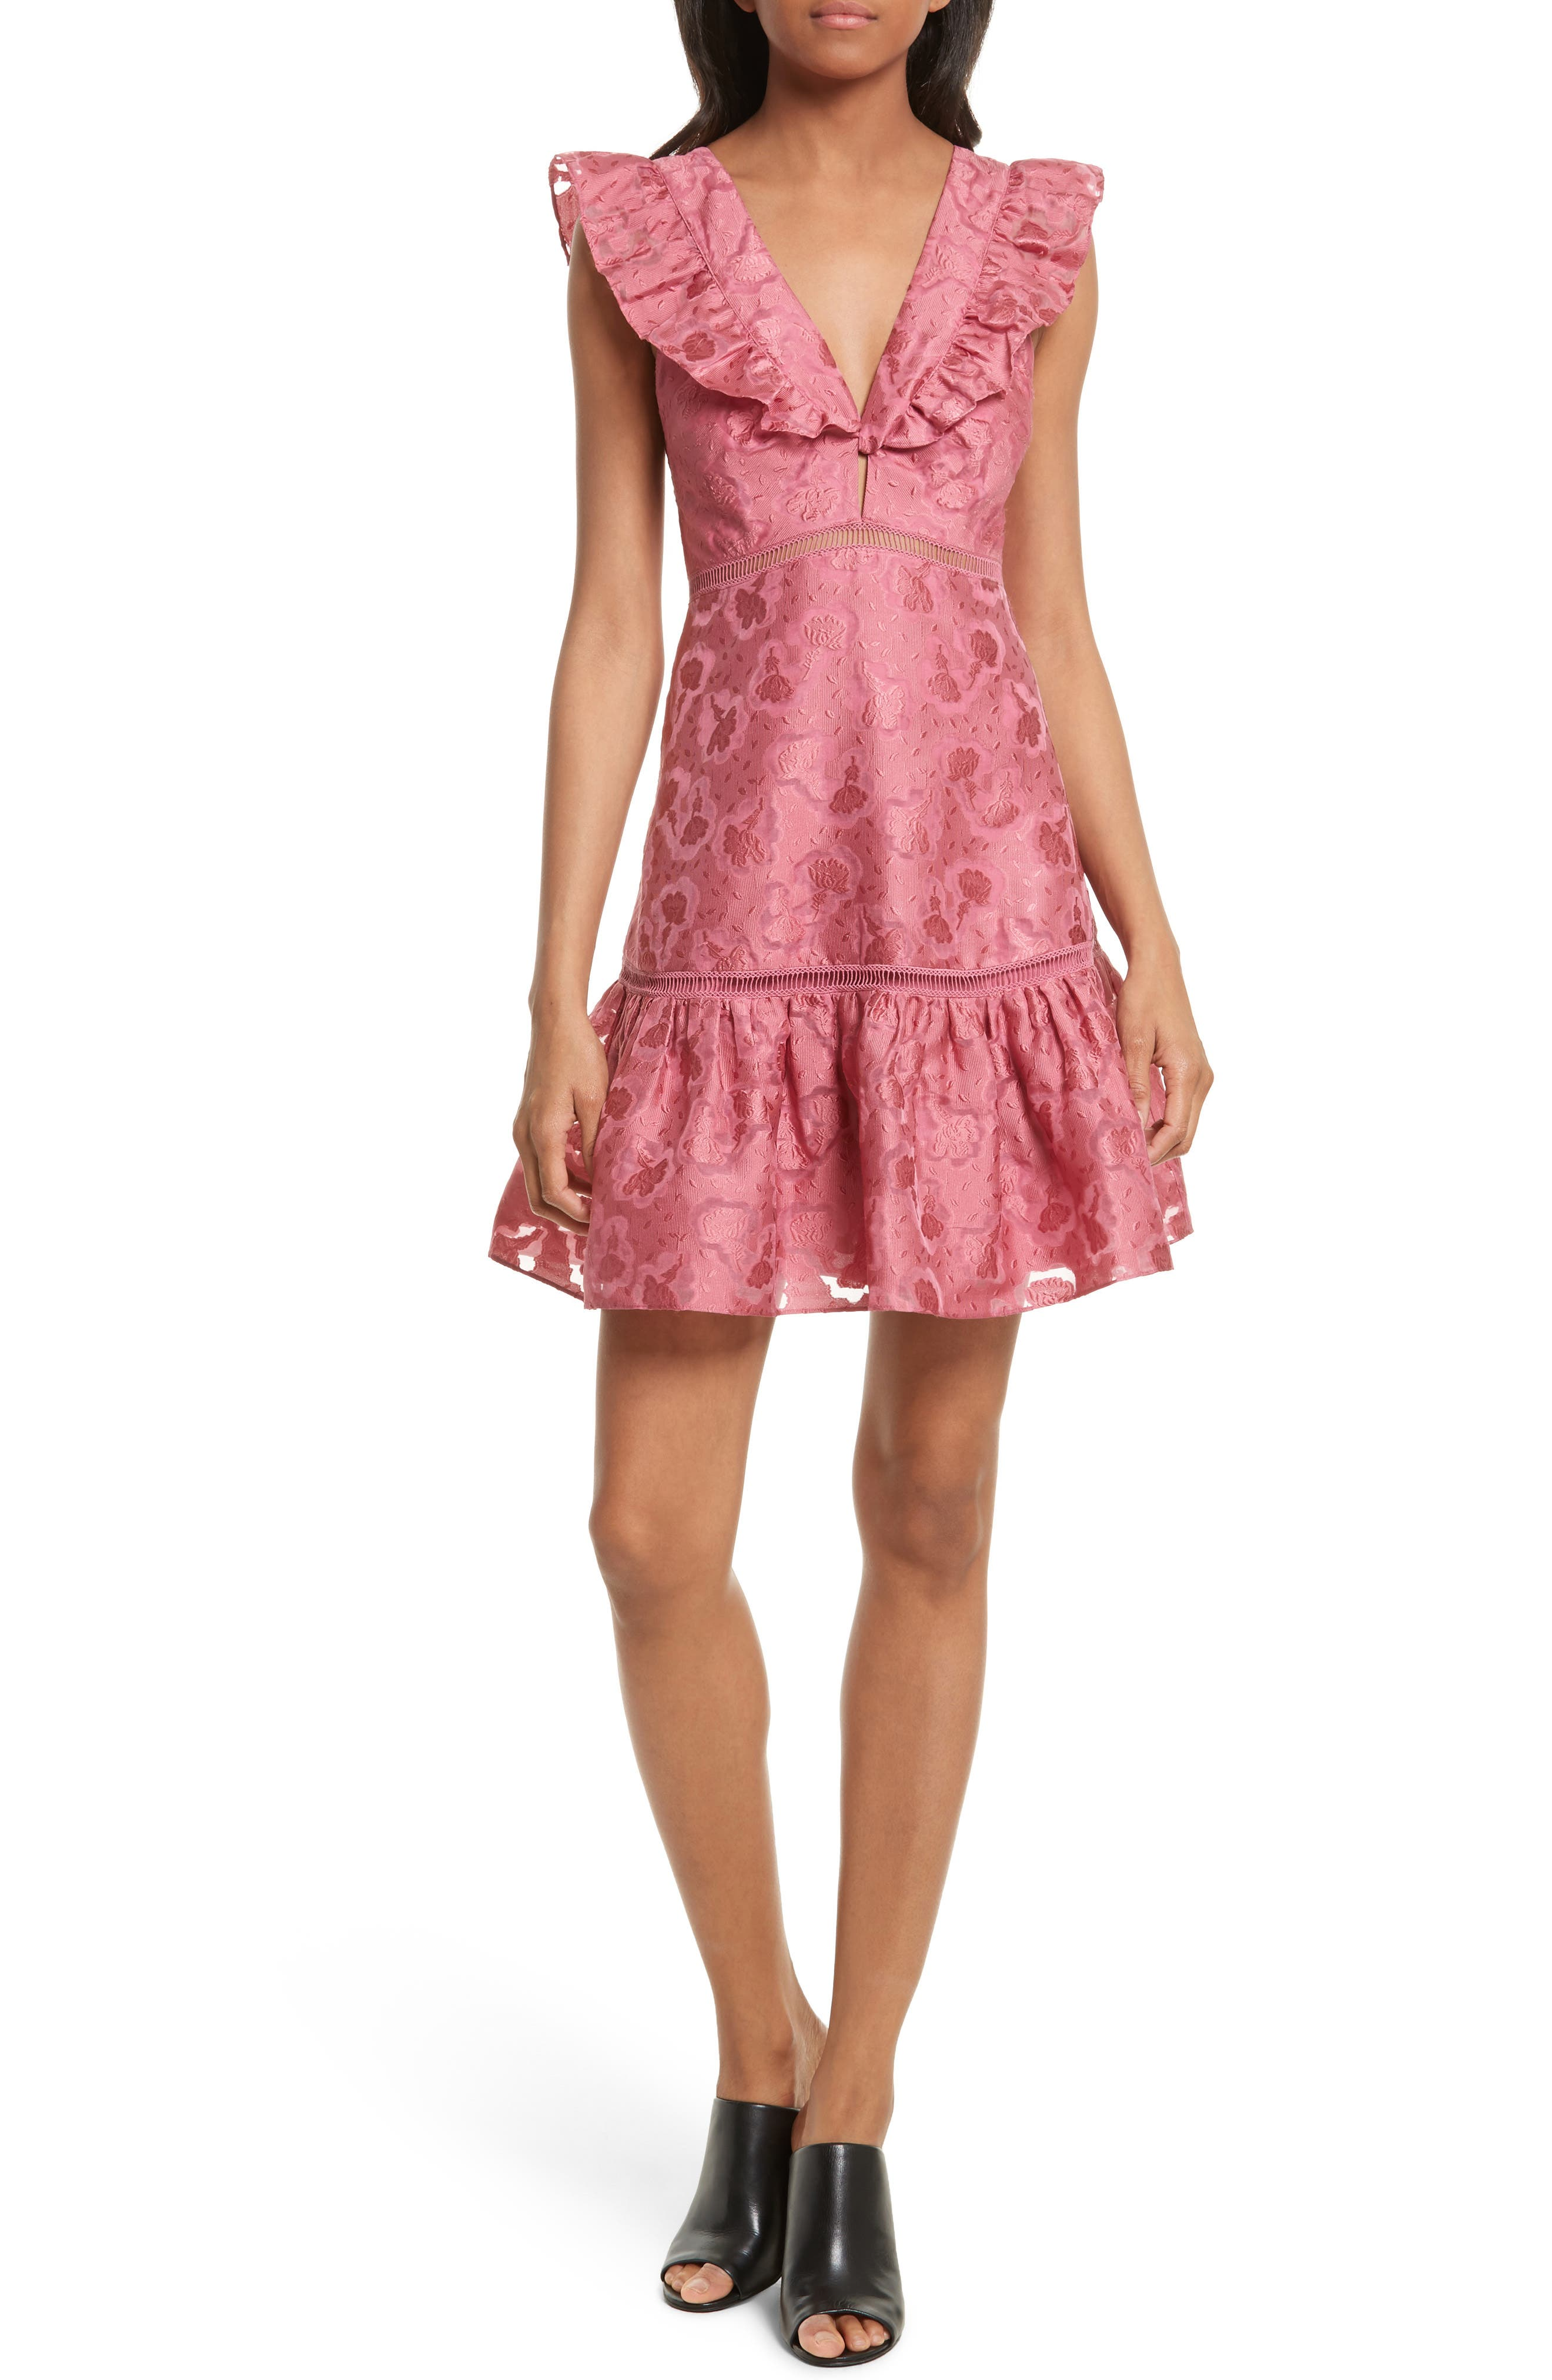 Alternate Image 1 Selected - Rebecca Taylor Aly Floral Jacquard Dress